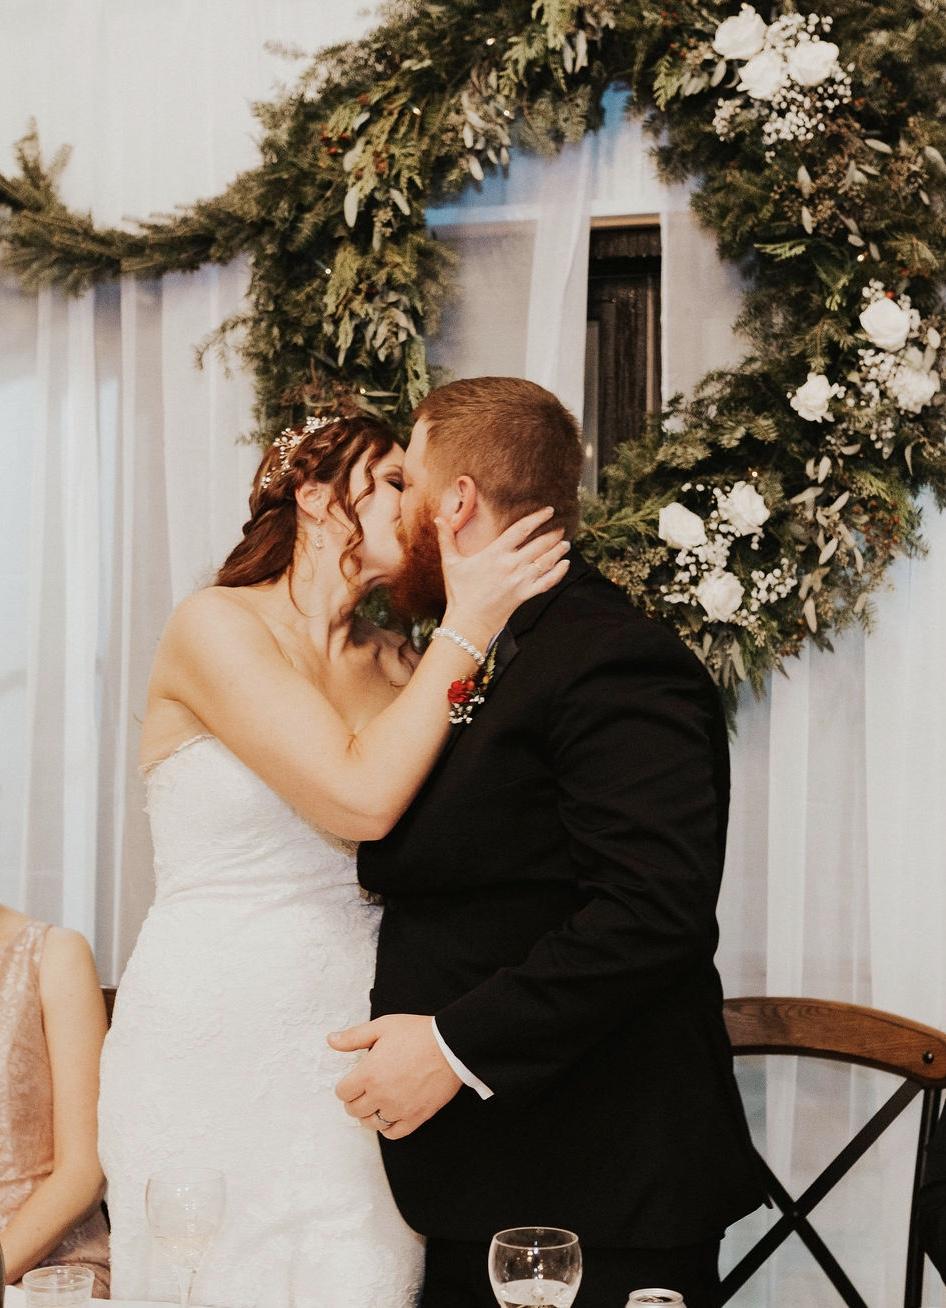 Joe & Ginger - Winter RomanceBreeanna Kay Photography